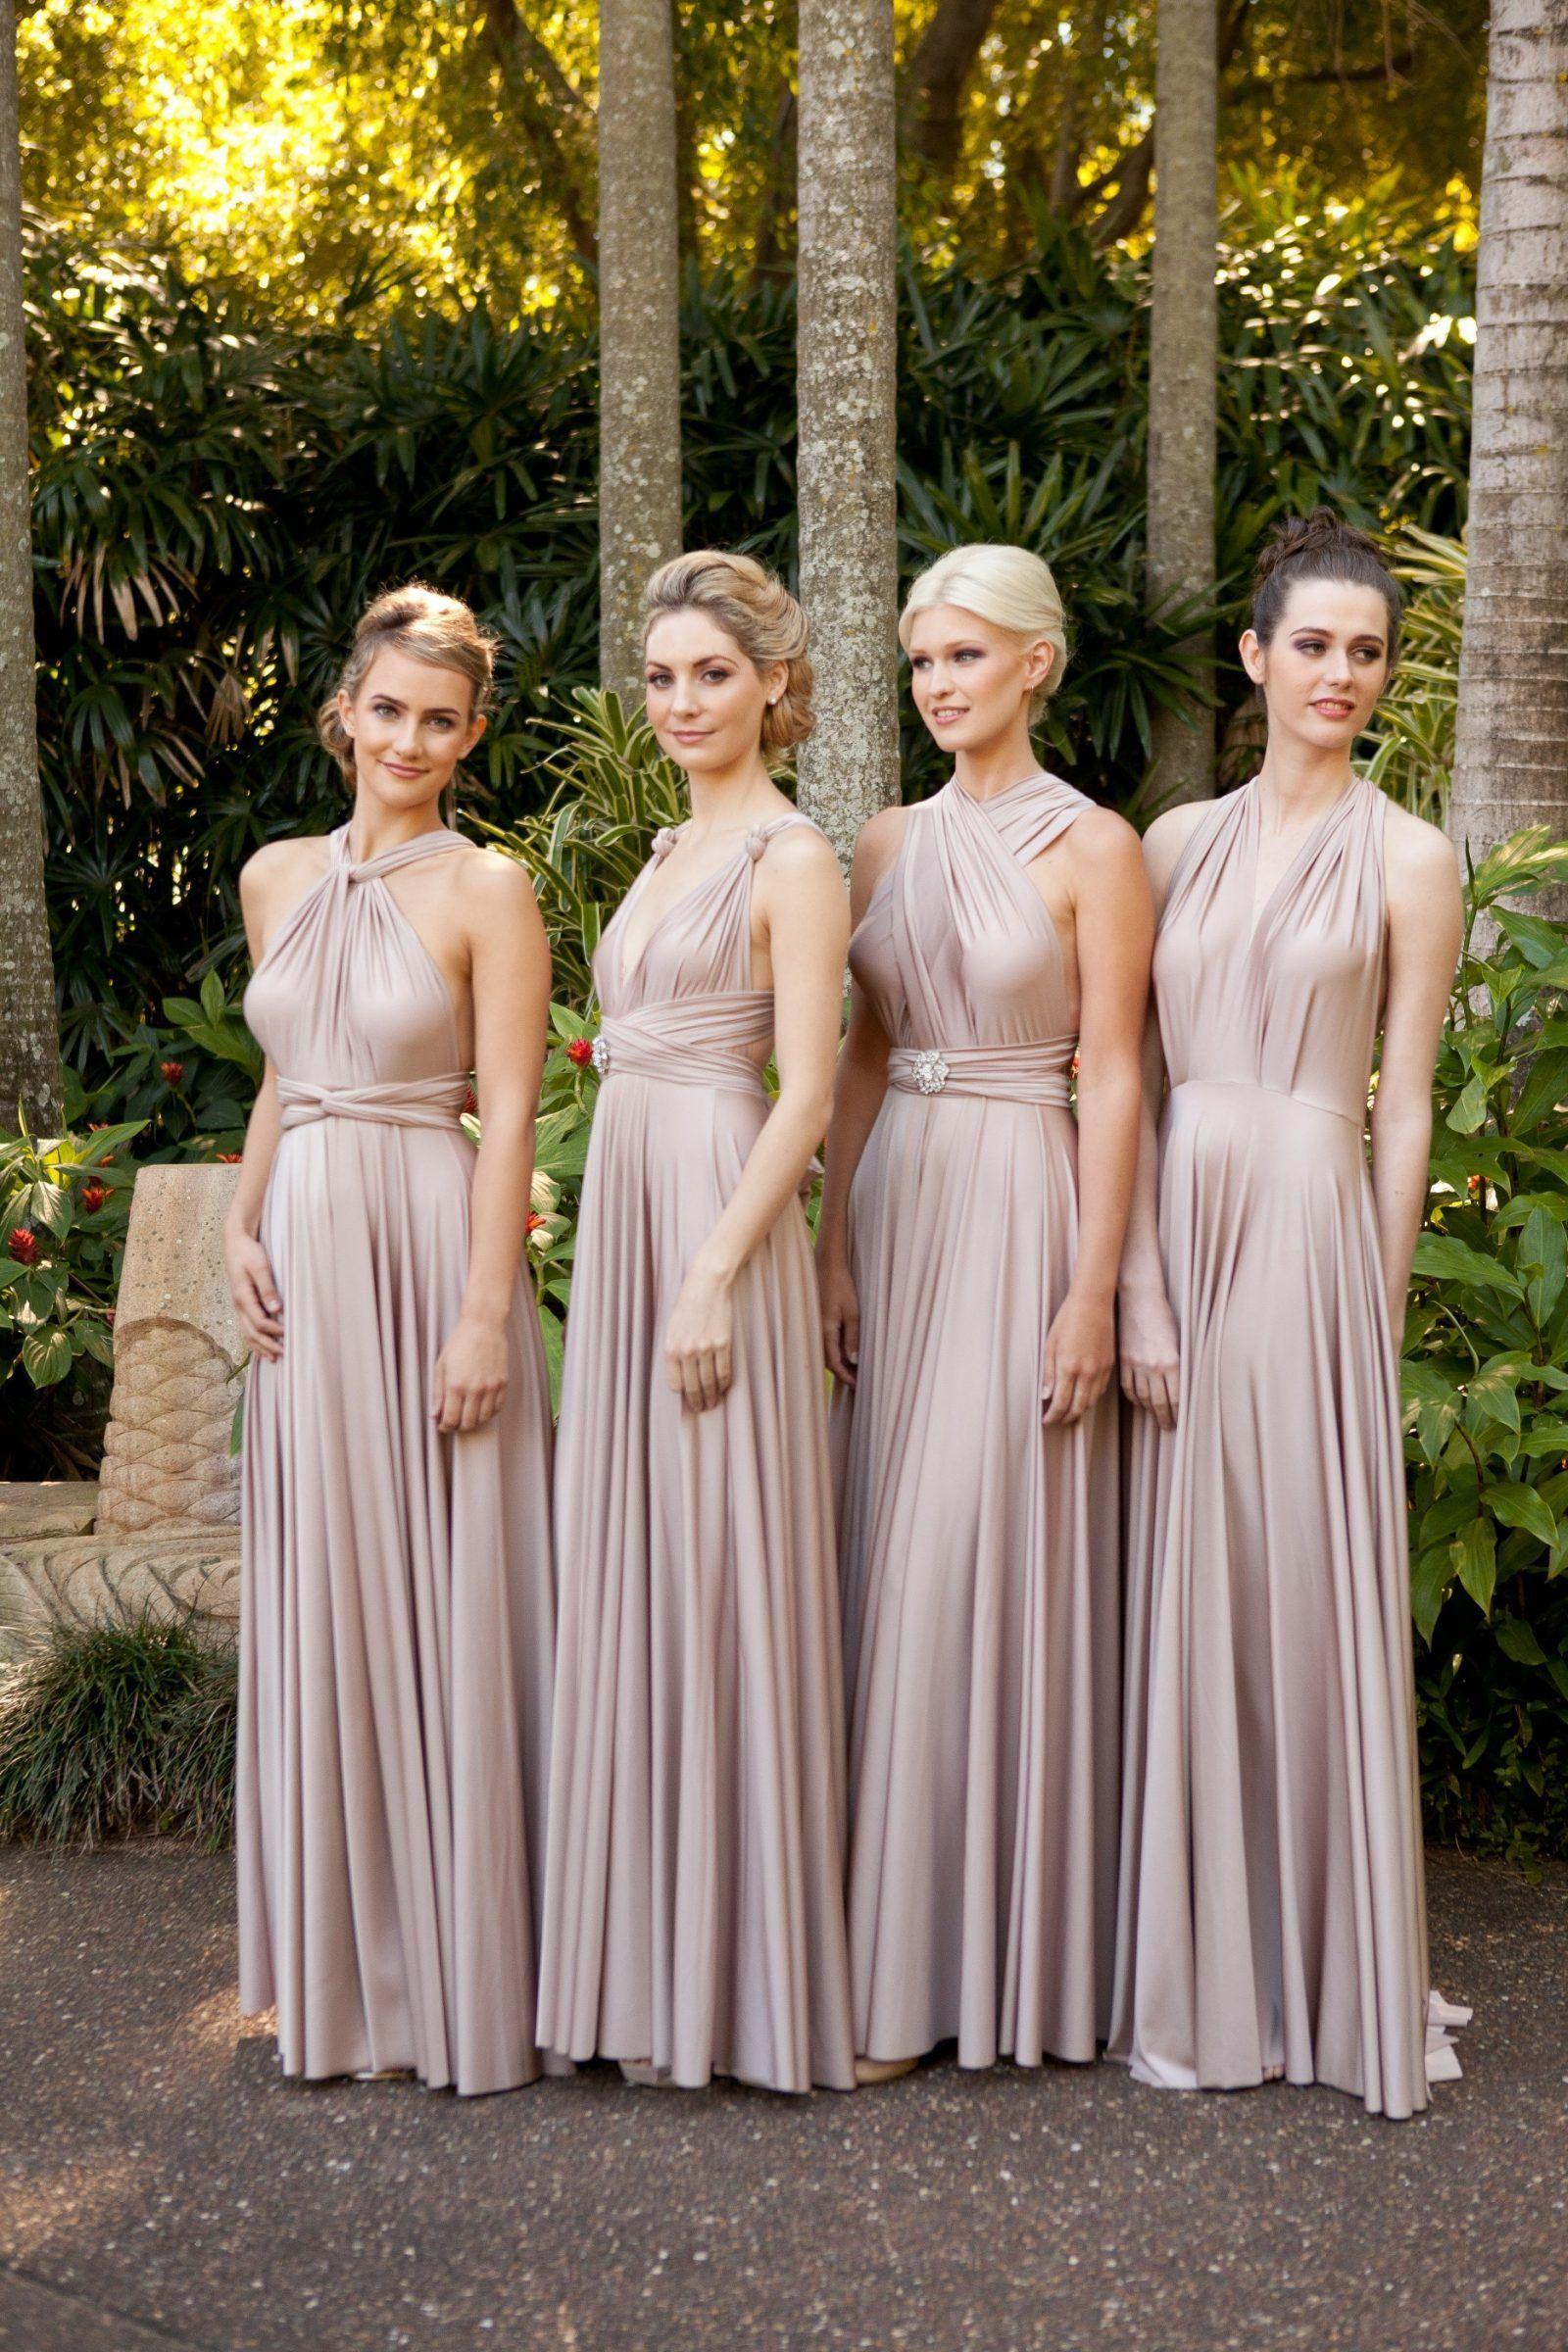 Convertible multiwear bridesmaid dresses gray dress long formal